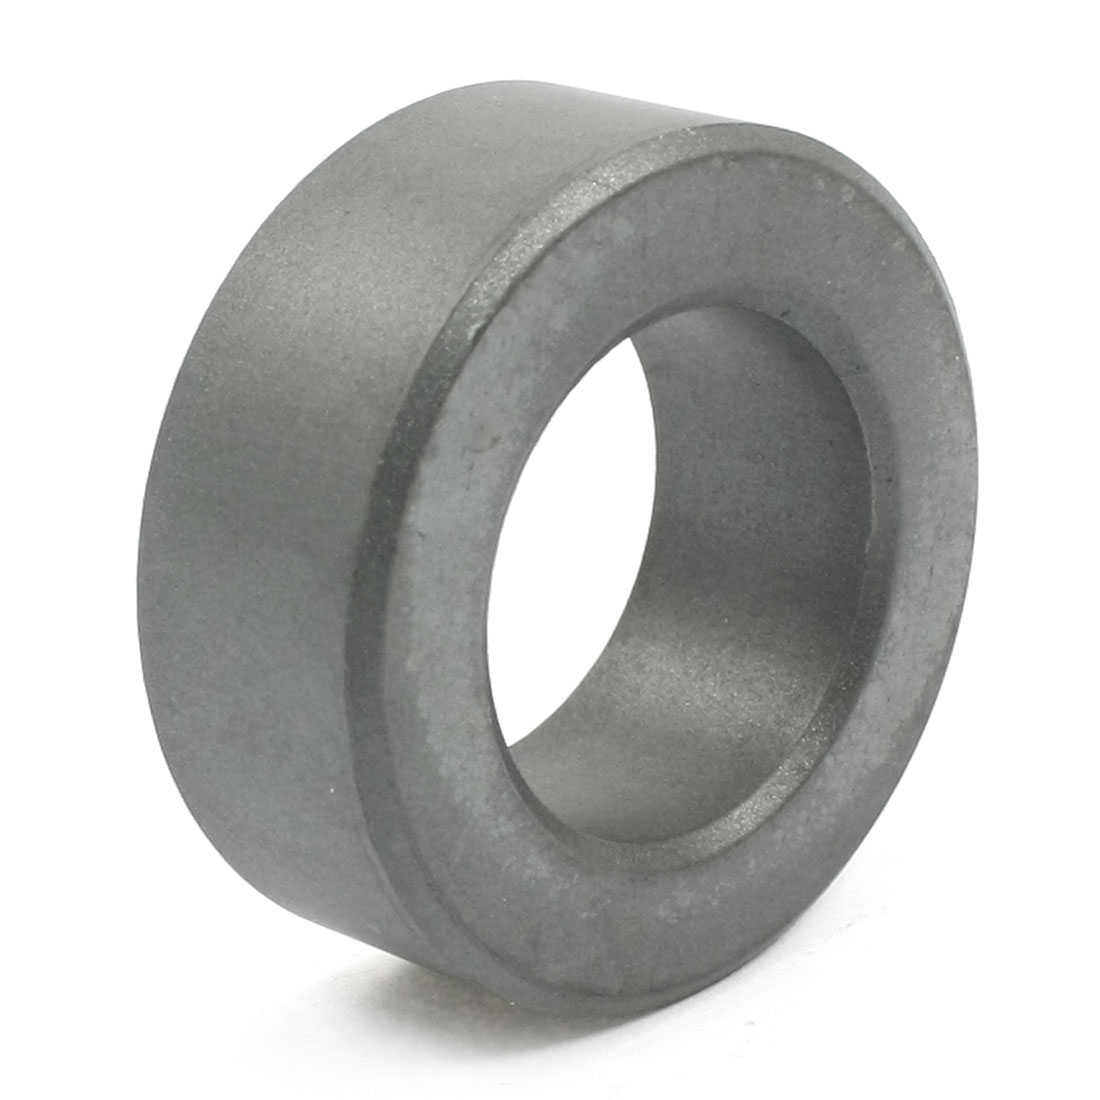 50mm External Diameter 20mm Thickness Ferrite Ring Core